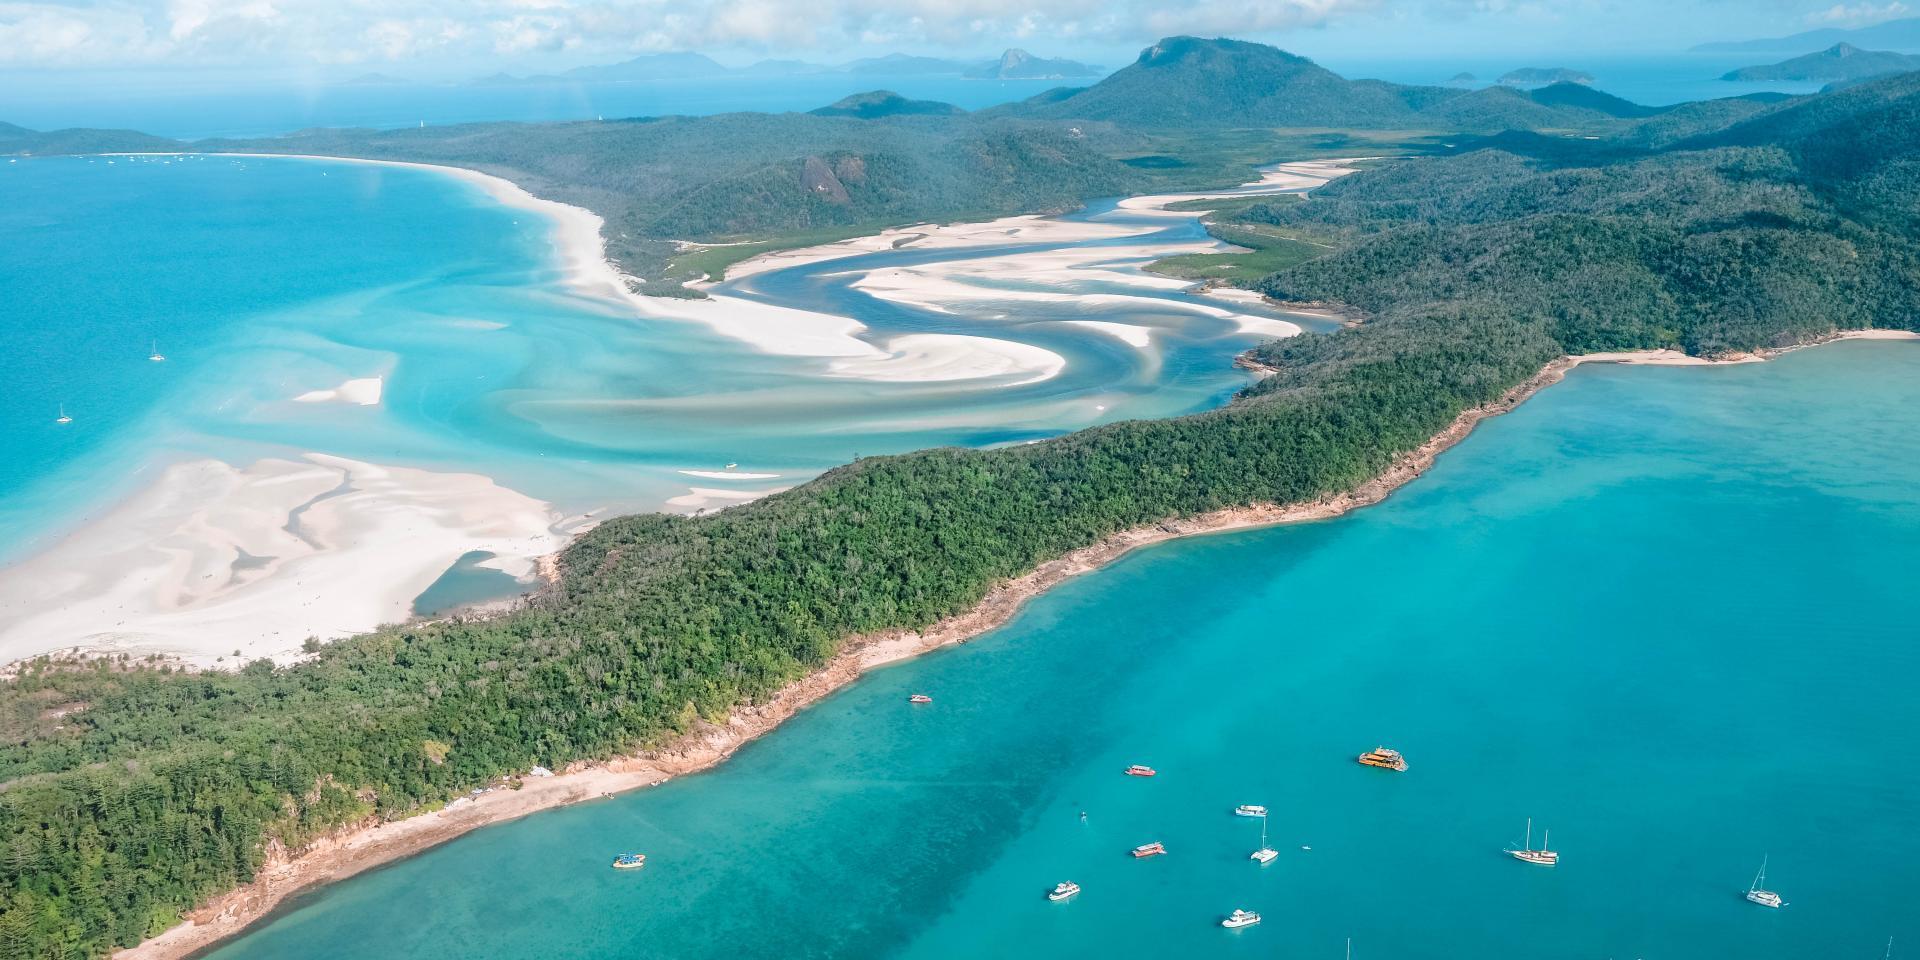 Great Barrier Reef Wallpaper High Resoution Ph #9518